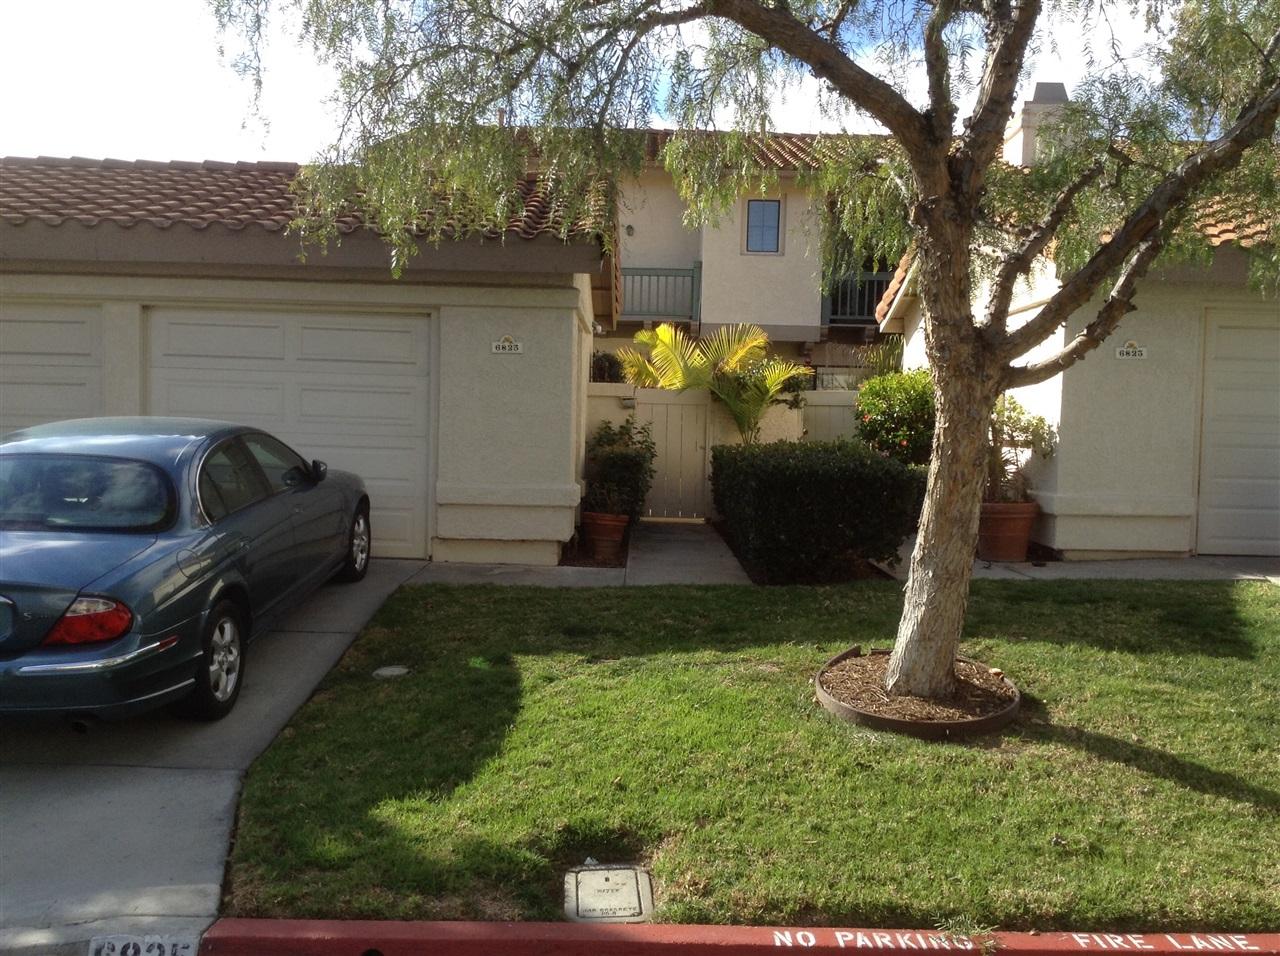 6825 Alderwood Dr, Carlsbad, CA